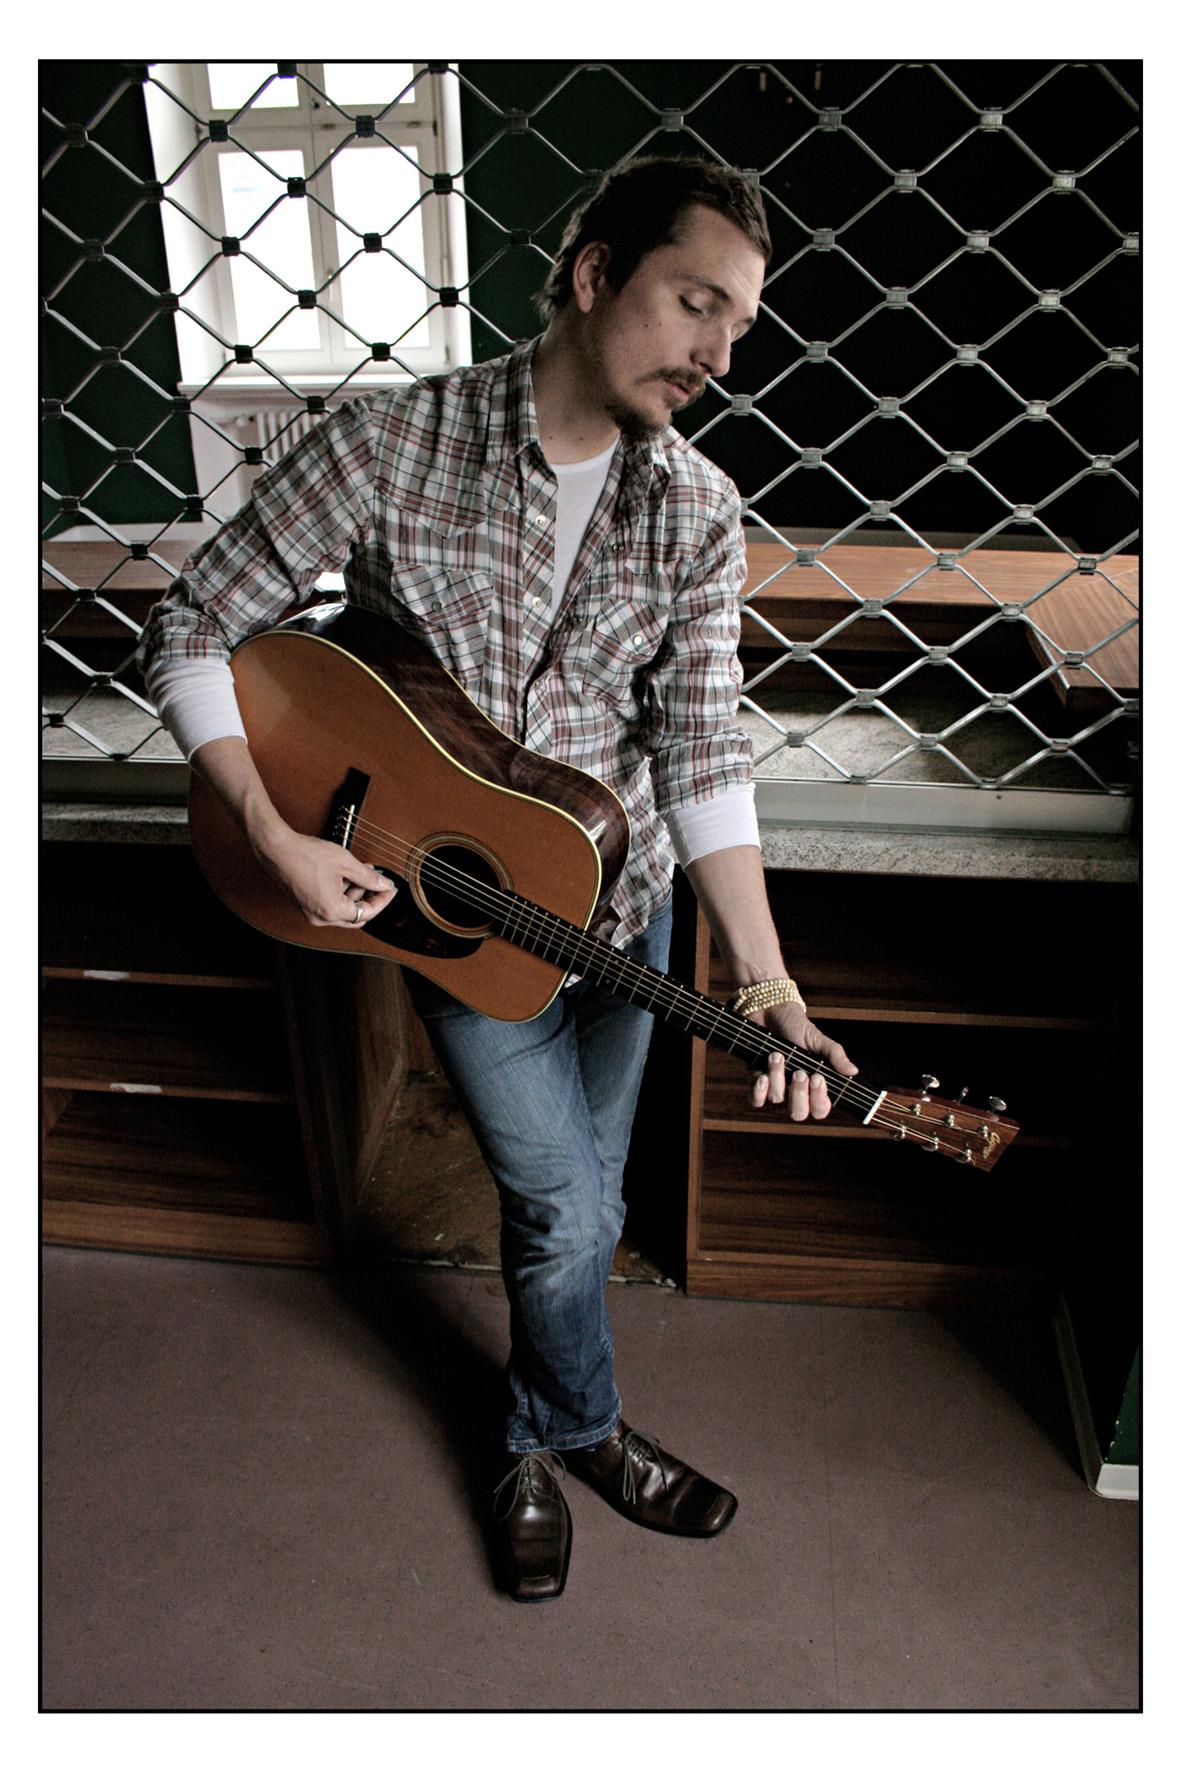 Shane Alexander Musician Wikipedia